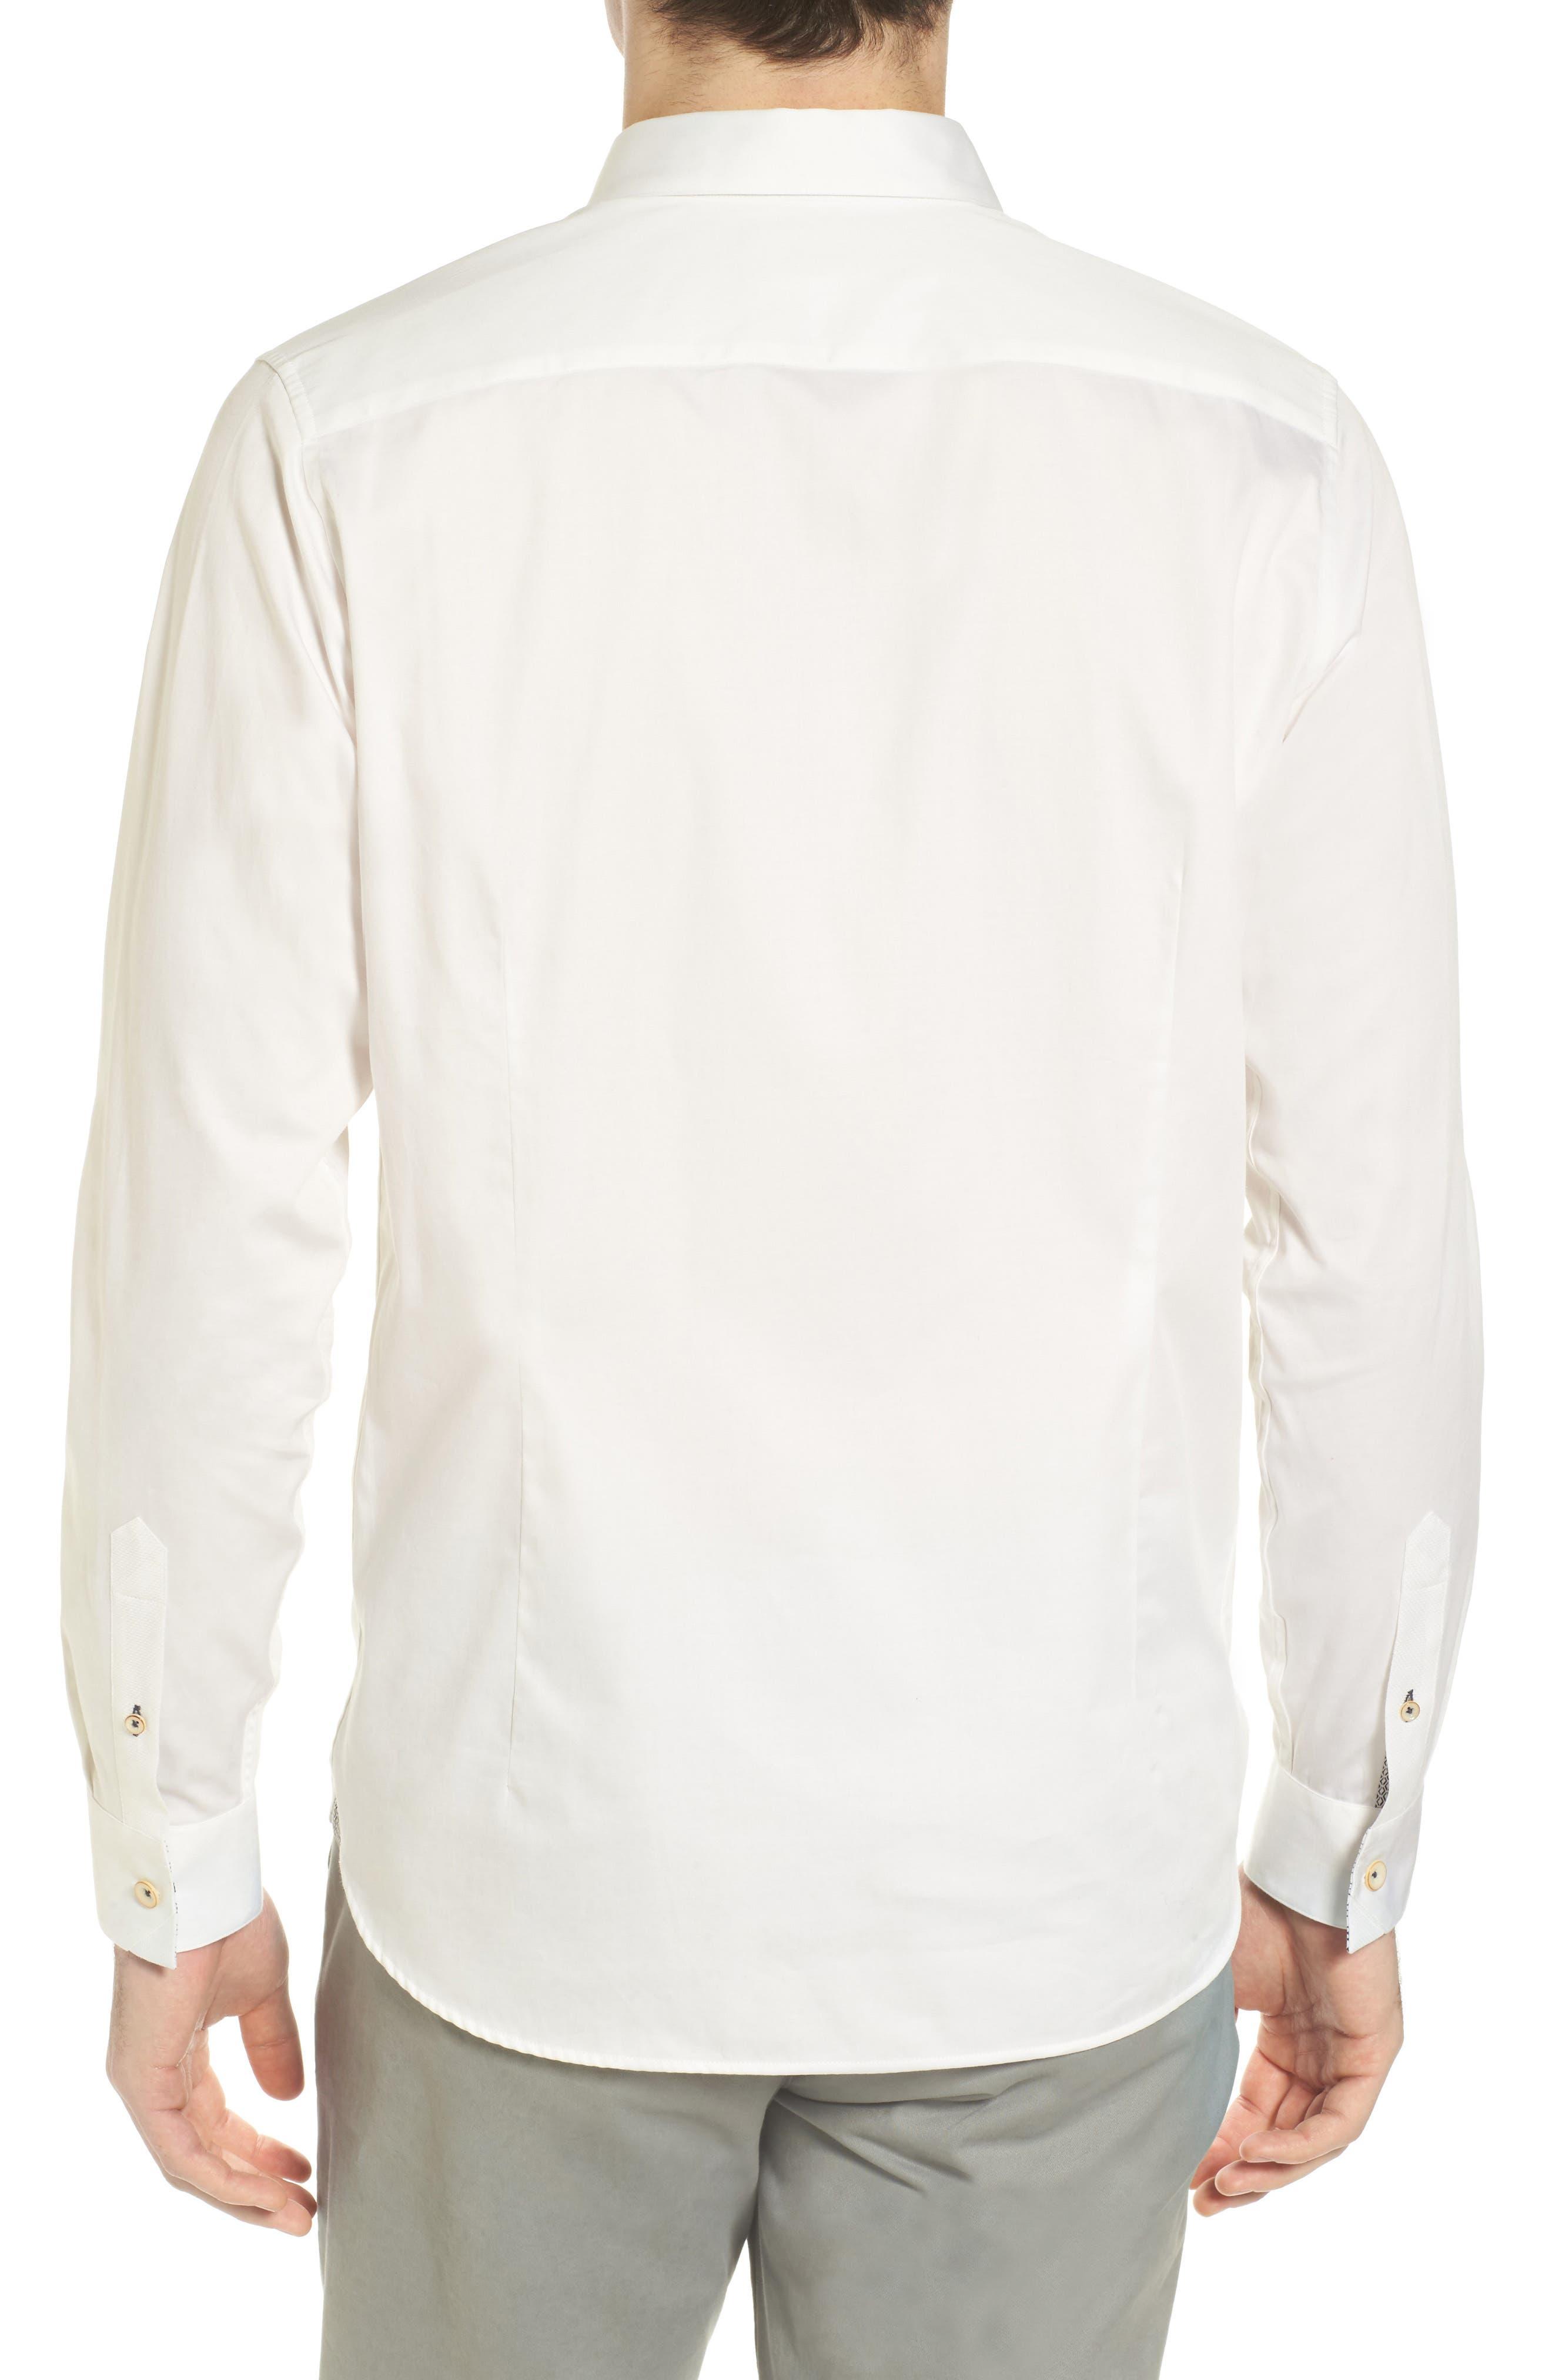 Byllytt Extra Slim Fit Stretch Solid Sport Shirt,                             Alternate thumbnail 2, color,                             100